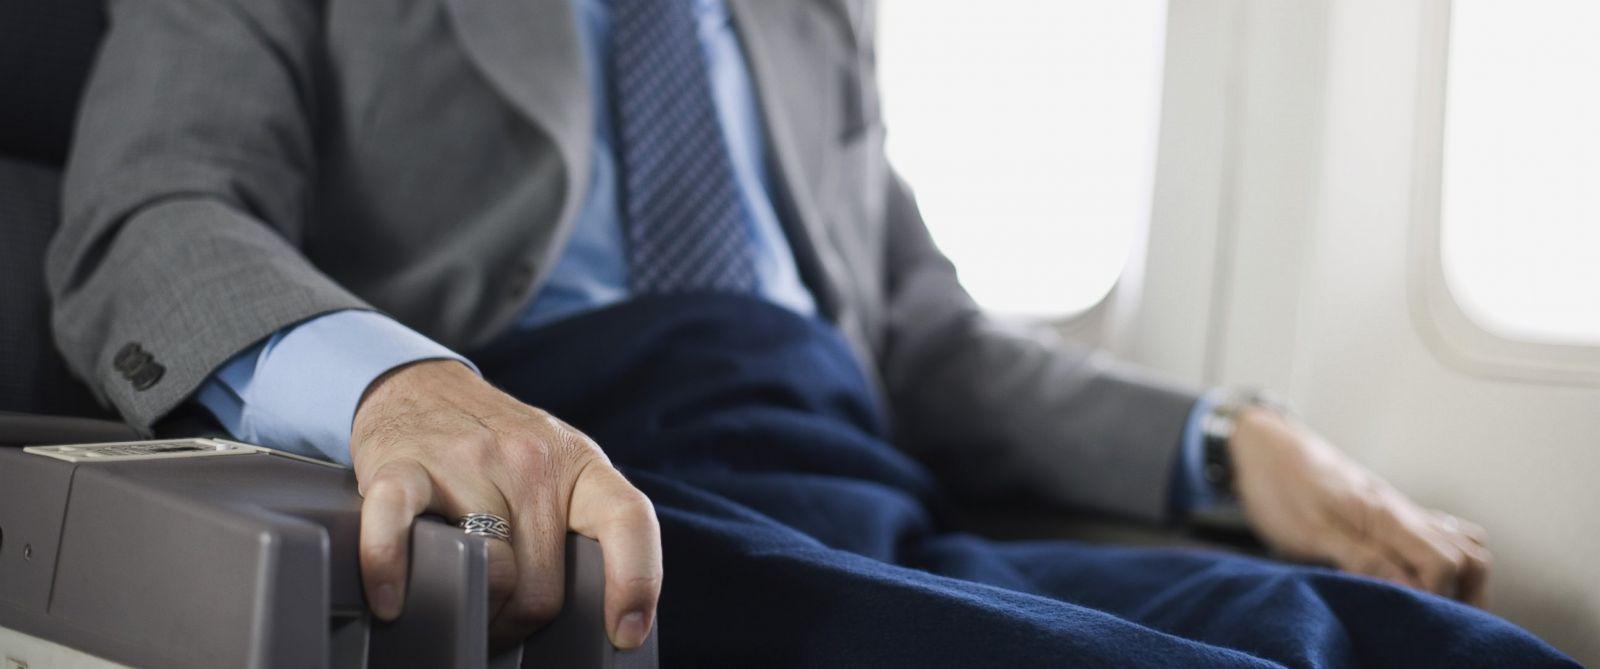 PHOTO: Nervous passenger sitting on airplane